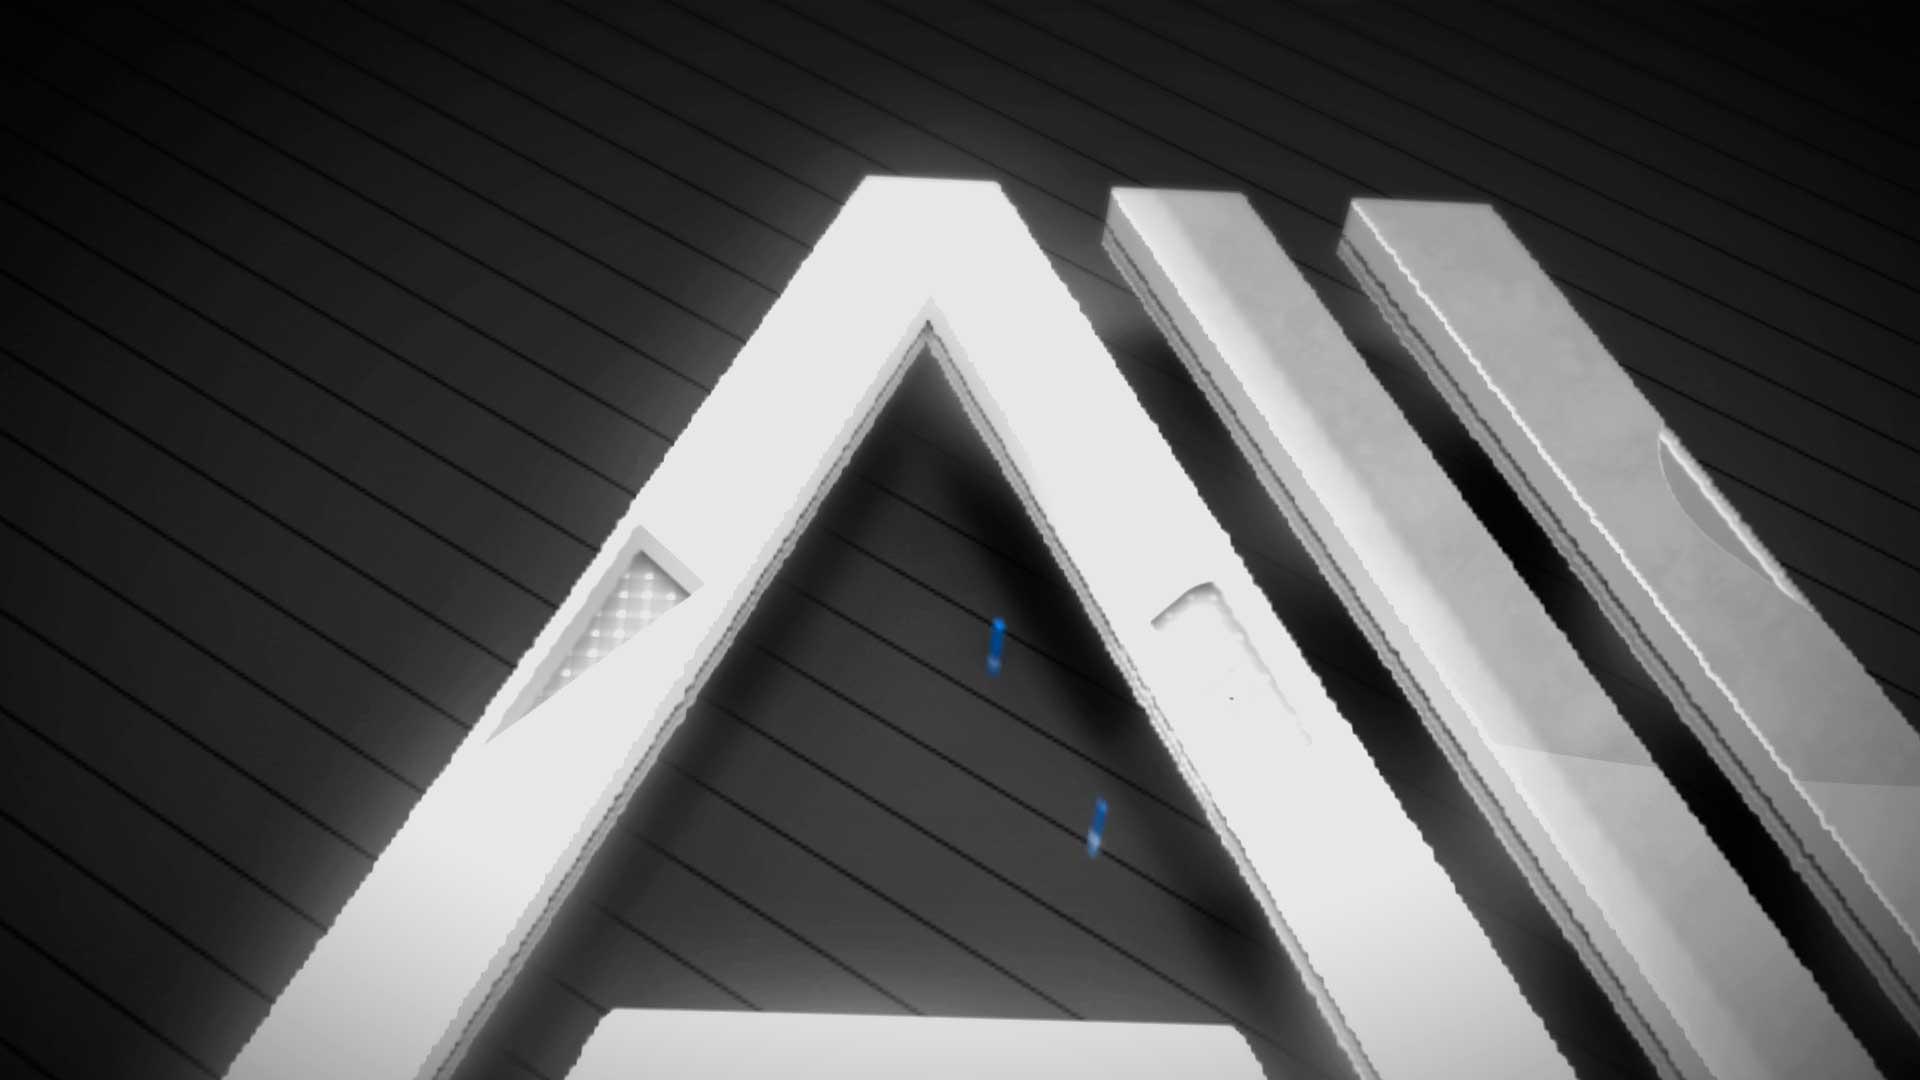 Logo-animado-Lineas-3d-AL211-imagen-animarlogo